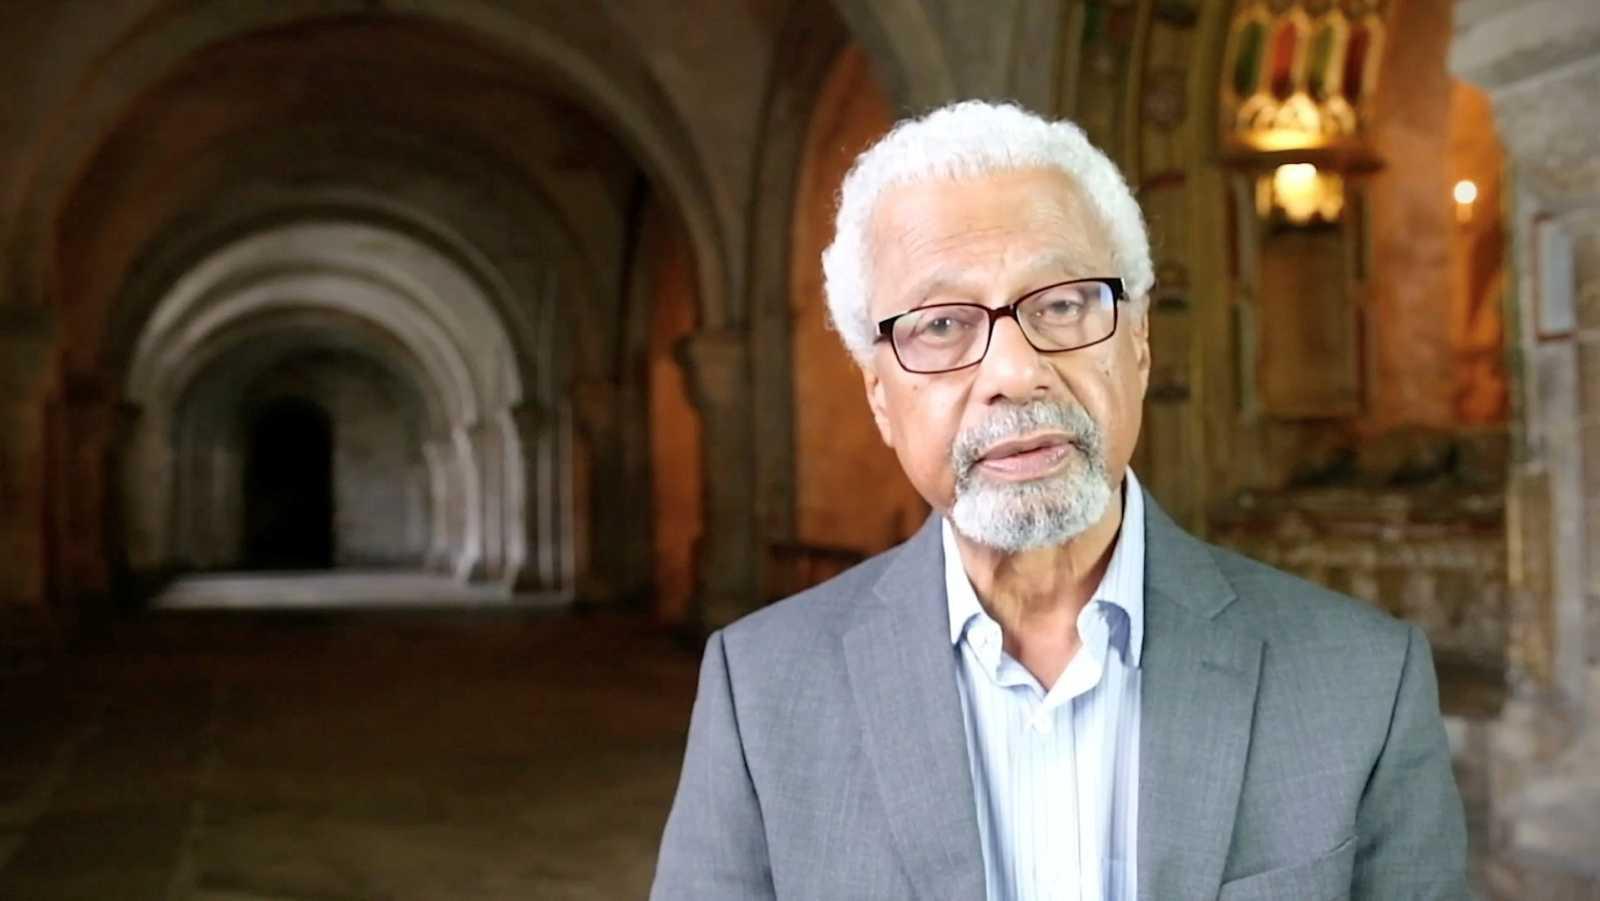 Abdulrazak Gurnah, Tanzanian Novelist of Colonialism and Refuge, Wins 2021 Nobel Prize in Literature